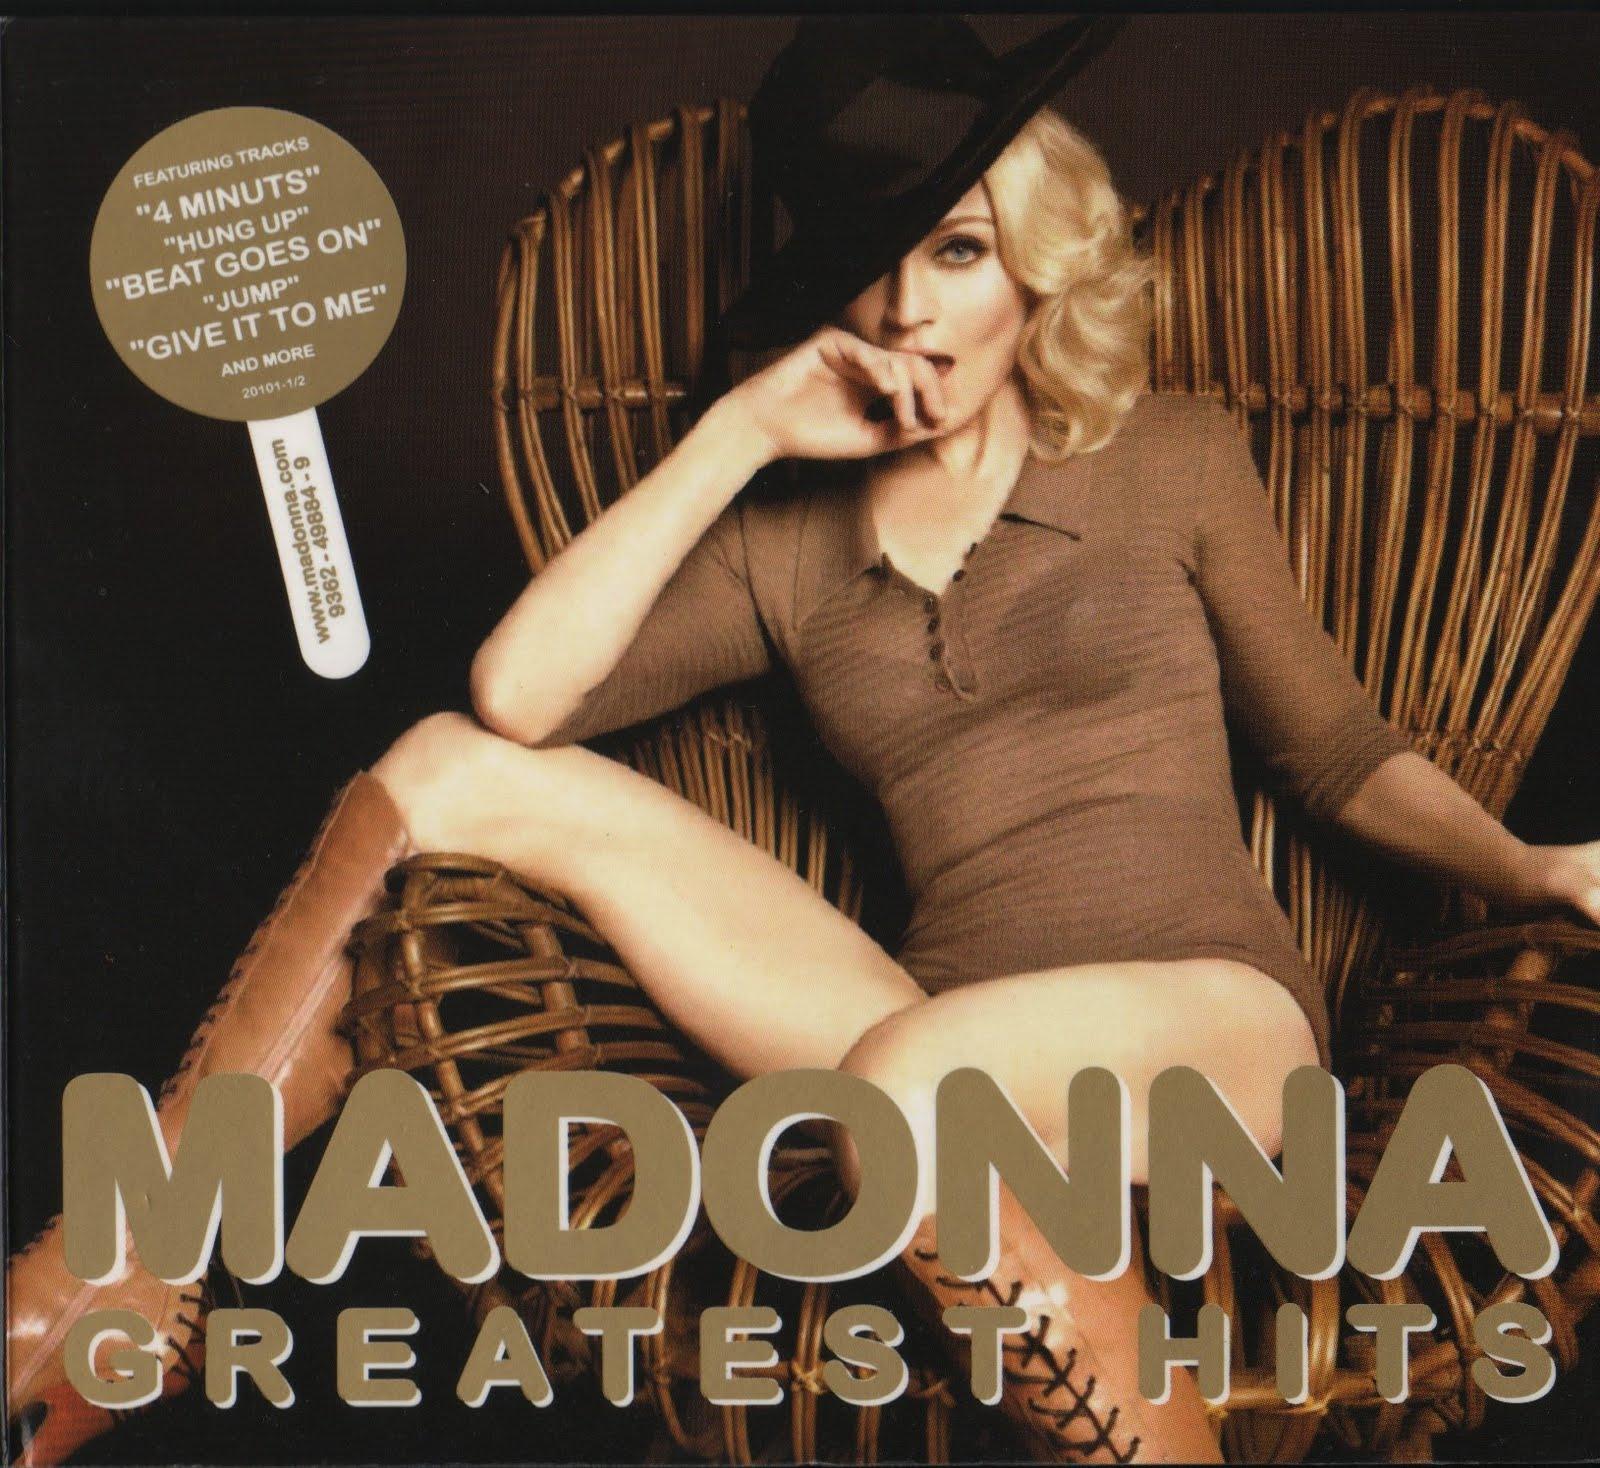 http://1.bp.blogspot.com/-YAhax_jaiYE/Tl5x59yNyCI/AAAAAAAAAos/VZjWnMYPDSw/s1600/Madonna%2B-%2BGreatest%2BHits%2B%25282008%2529%2B2CD.jpg